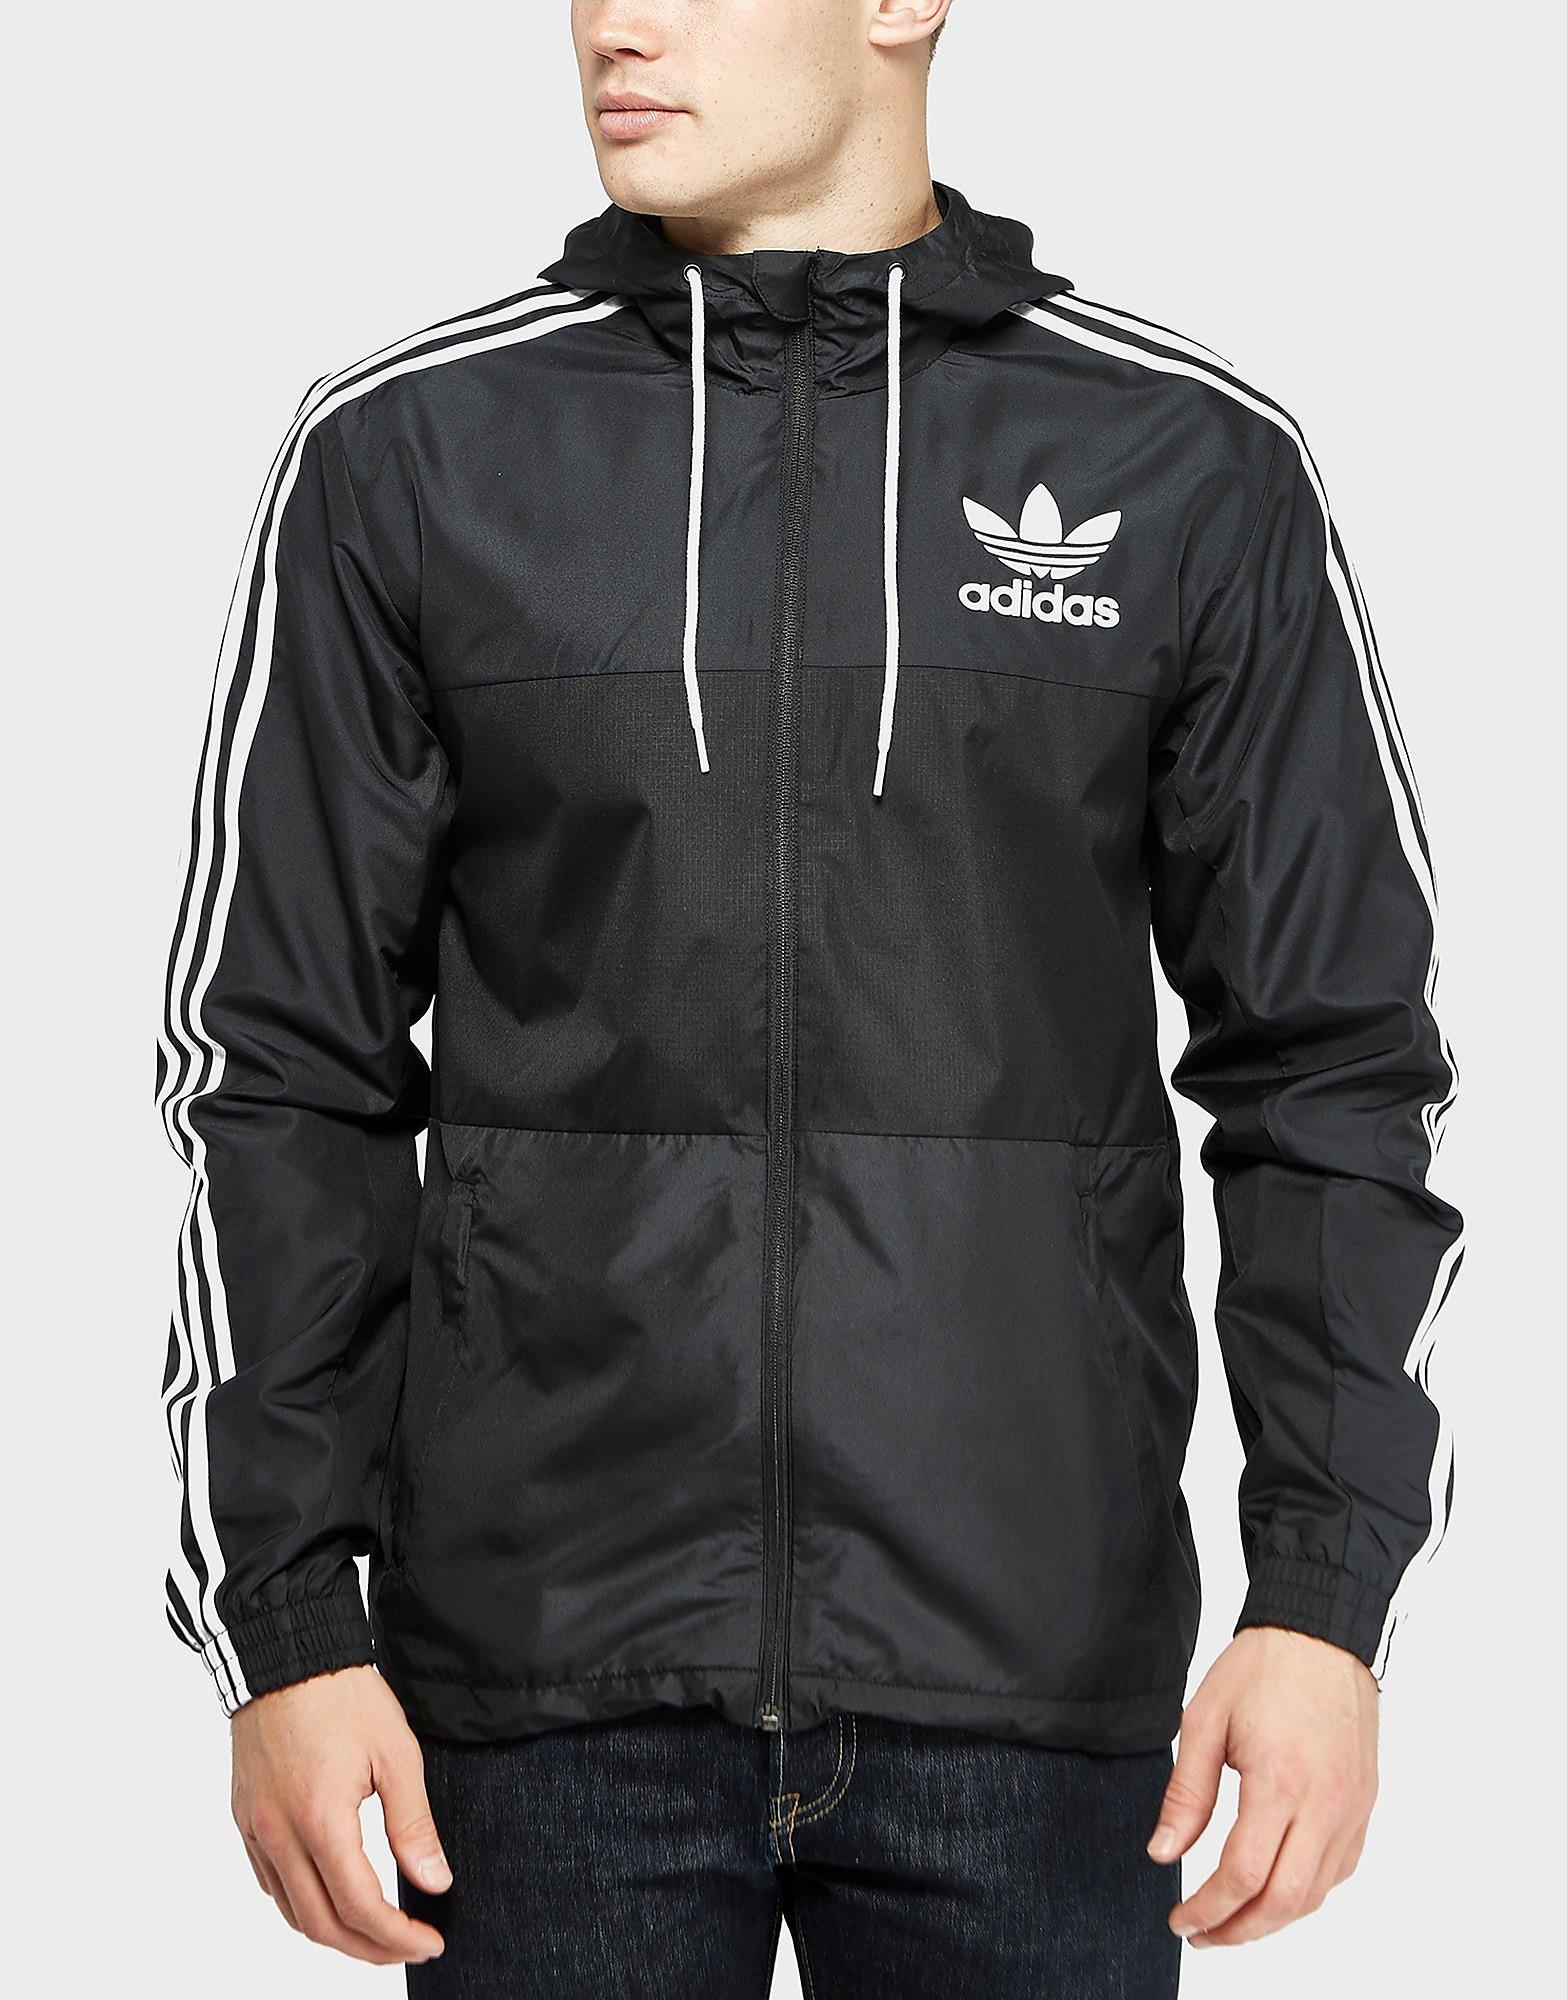 adidas Originals California Windbreaker Lightweight Jacket